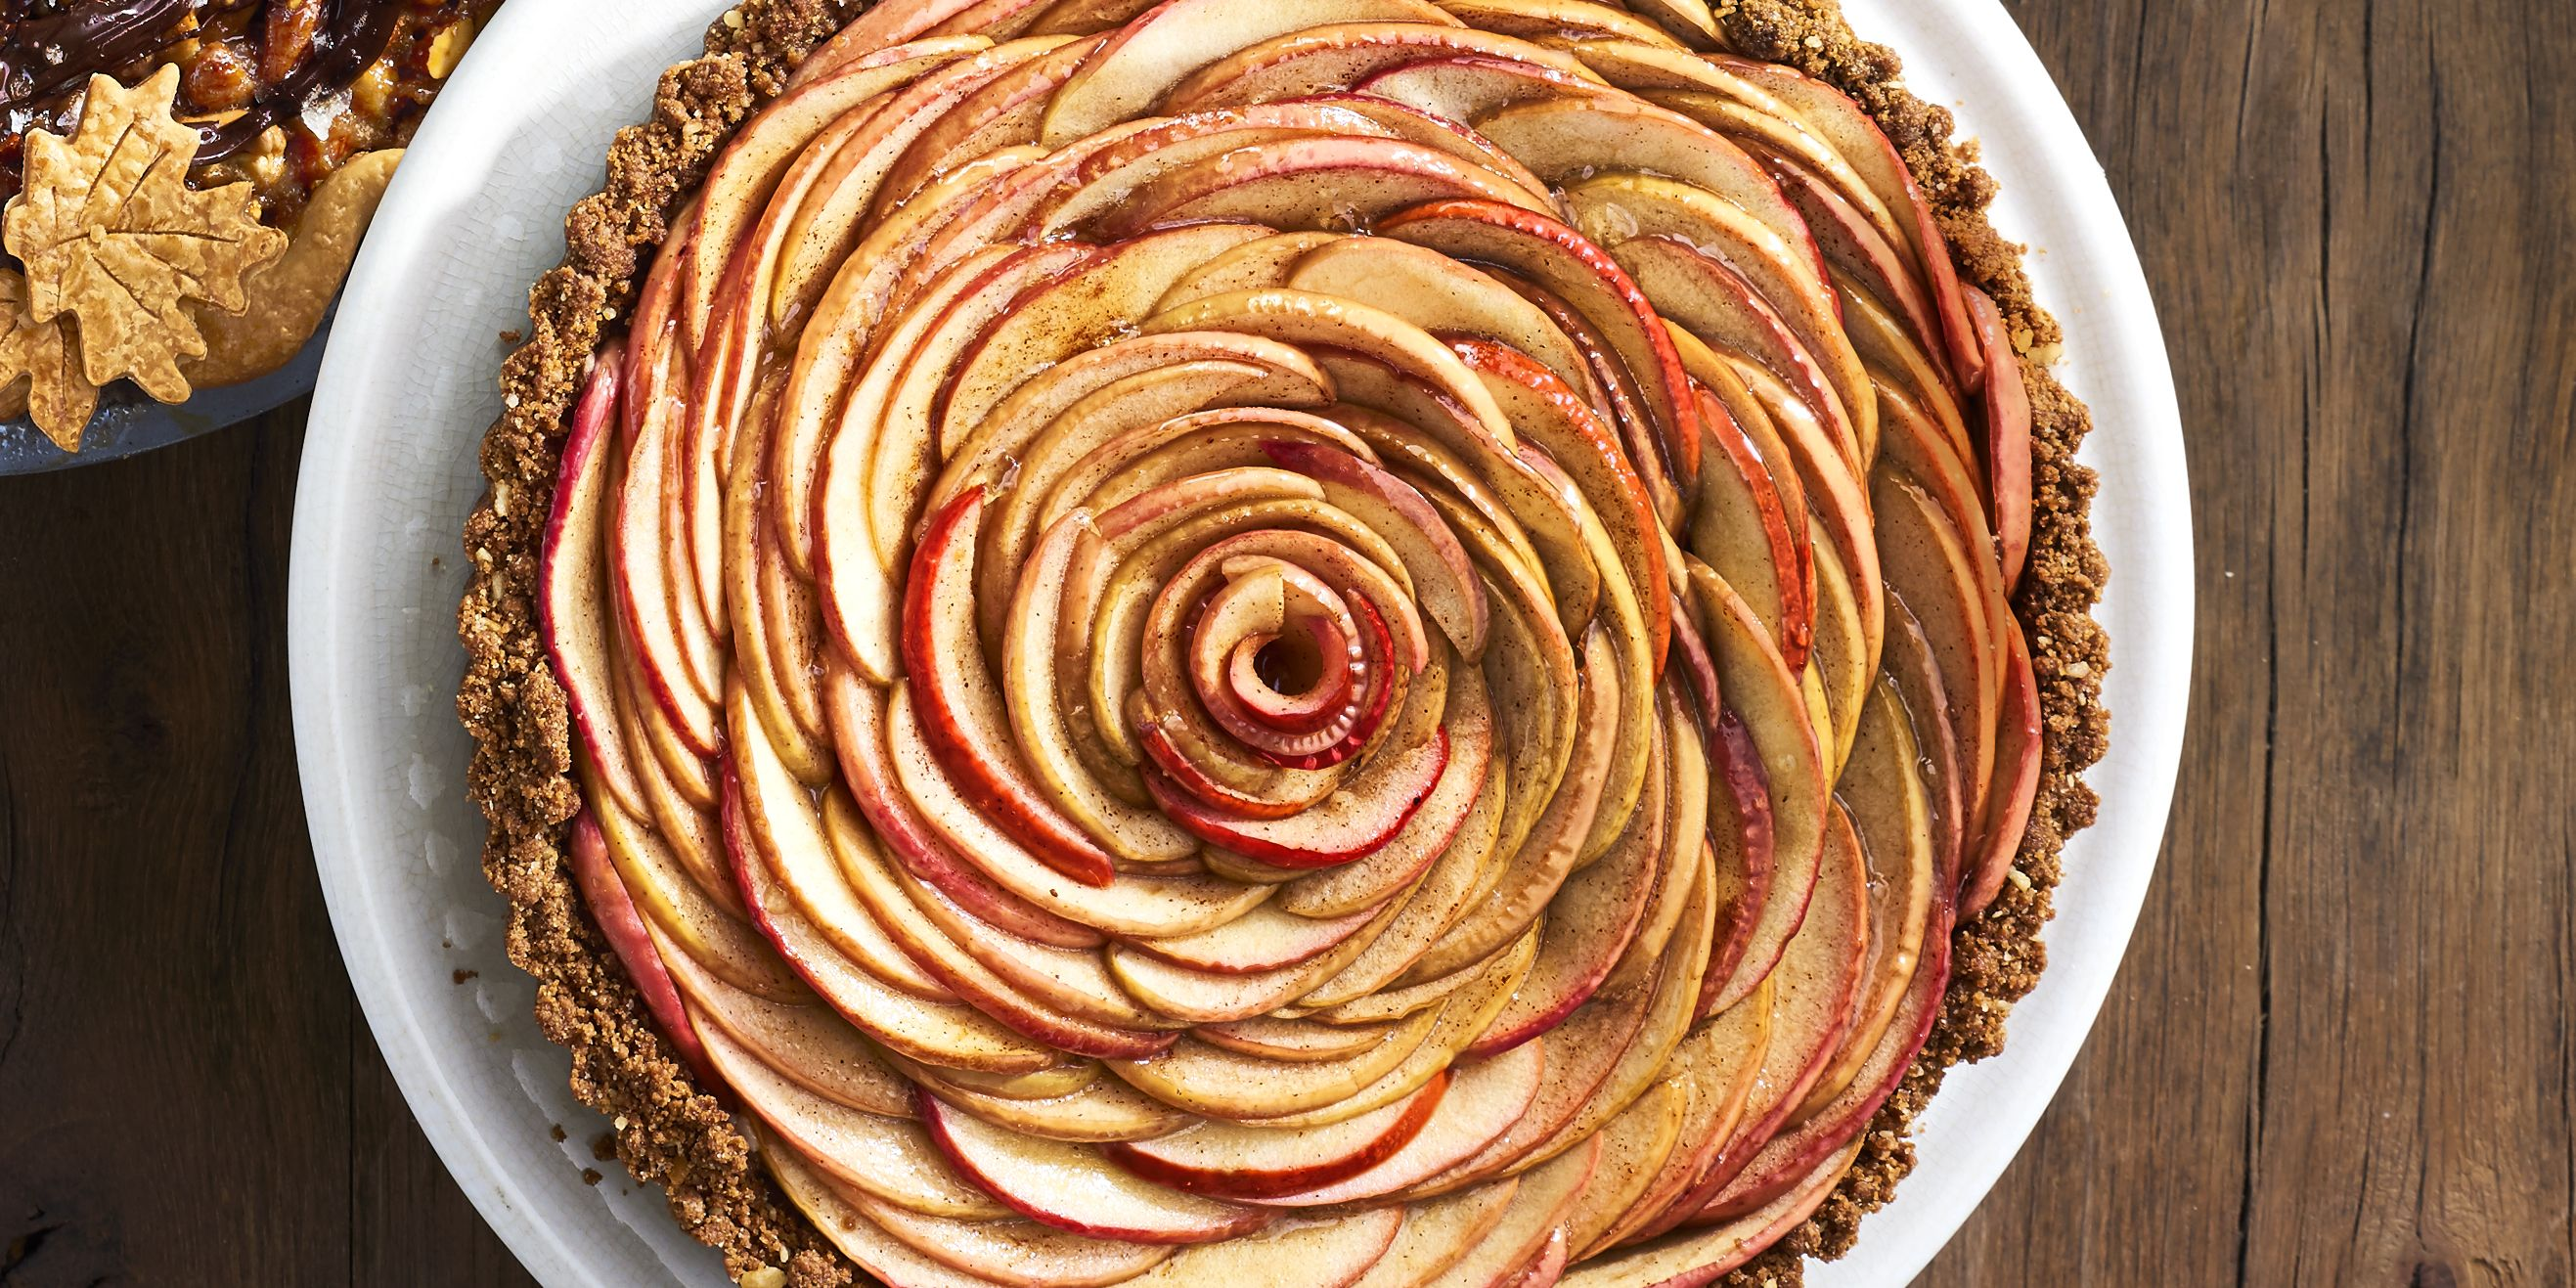 53 Easy Apple Dessert Recipes Simple Ideas For Apple Desserts